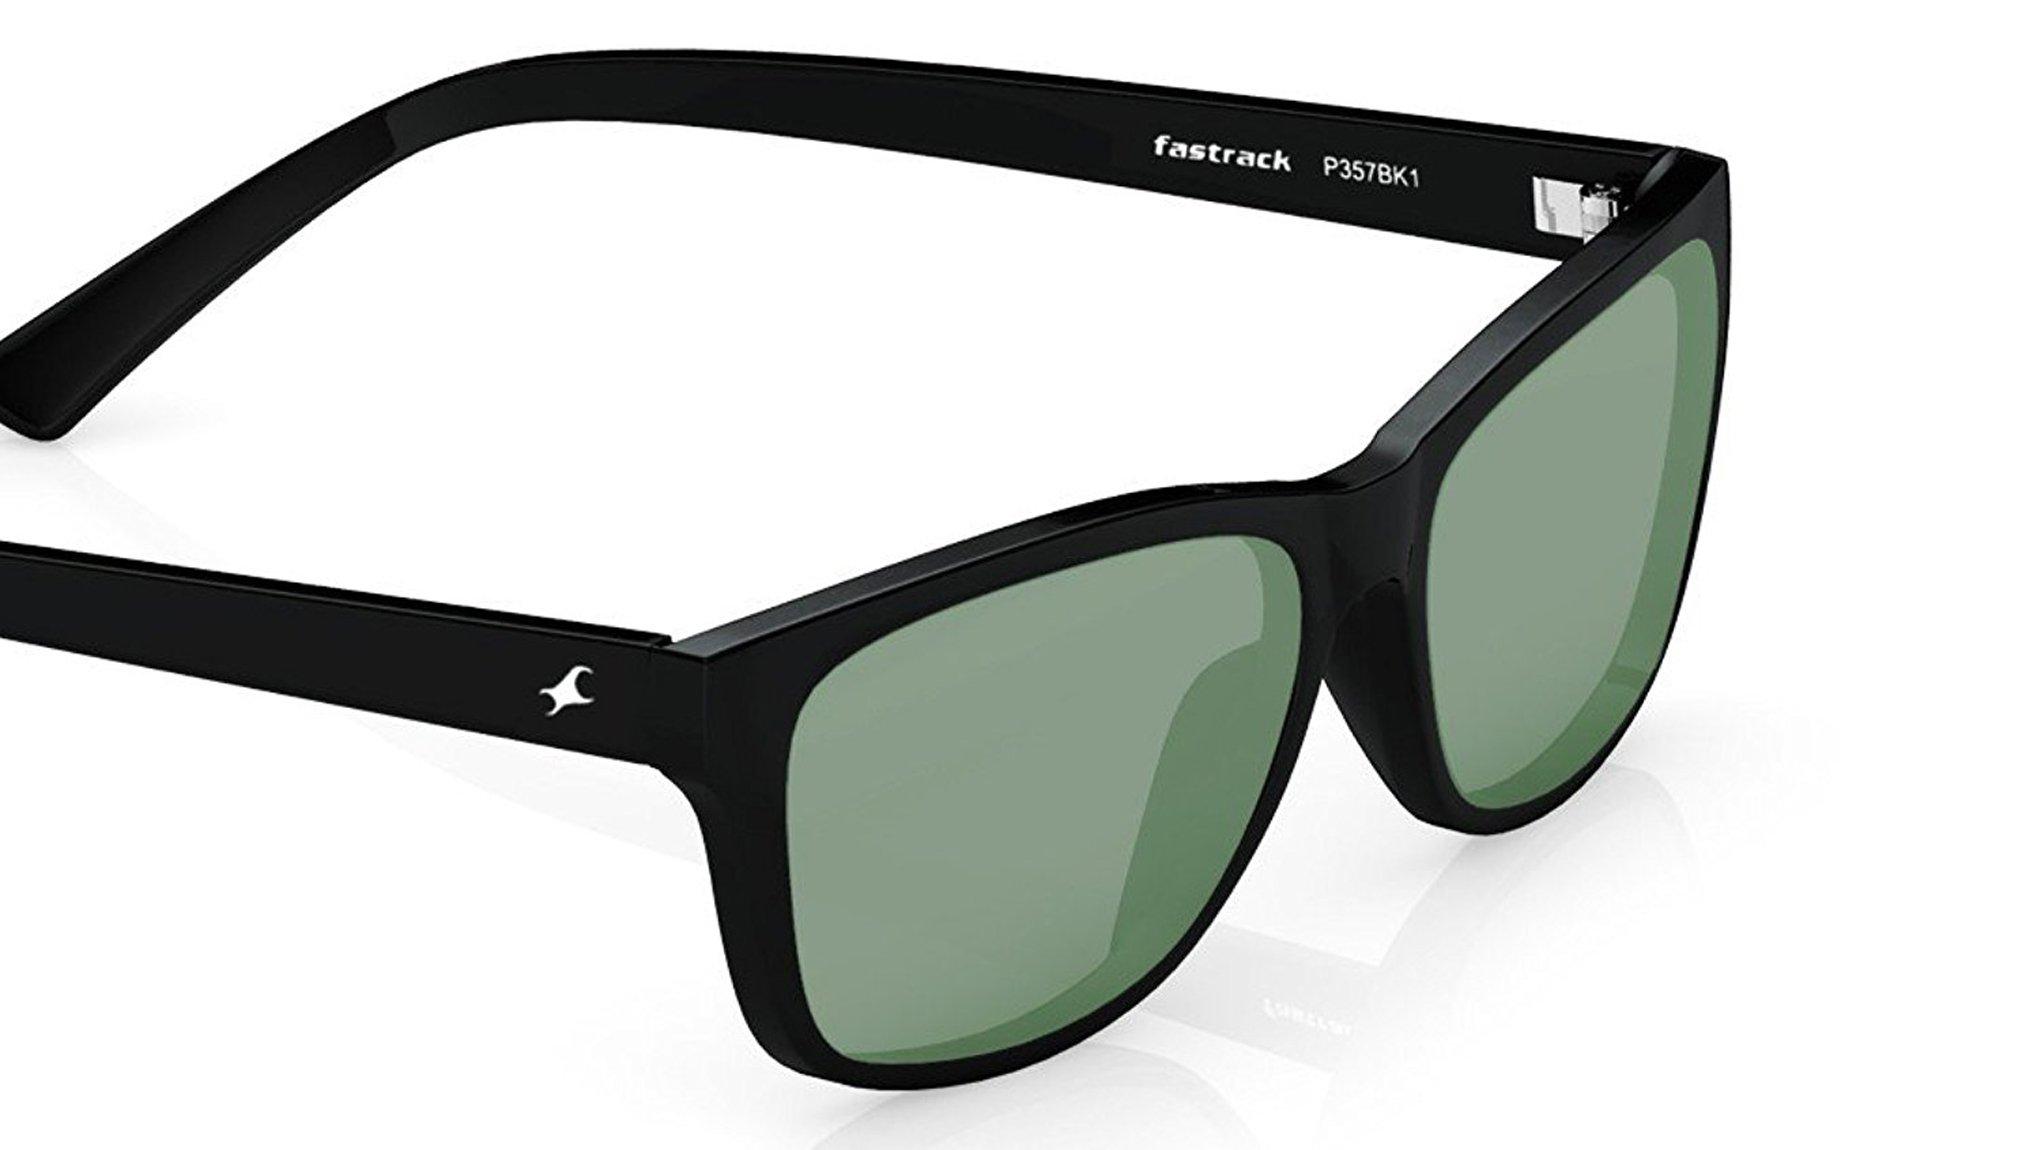 Fastrack UV protected Square Men's Sunglasses (P357BK1|41 millimeters|Smoke (Grey/Black)) product image